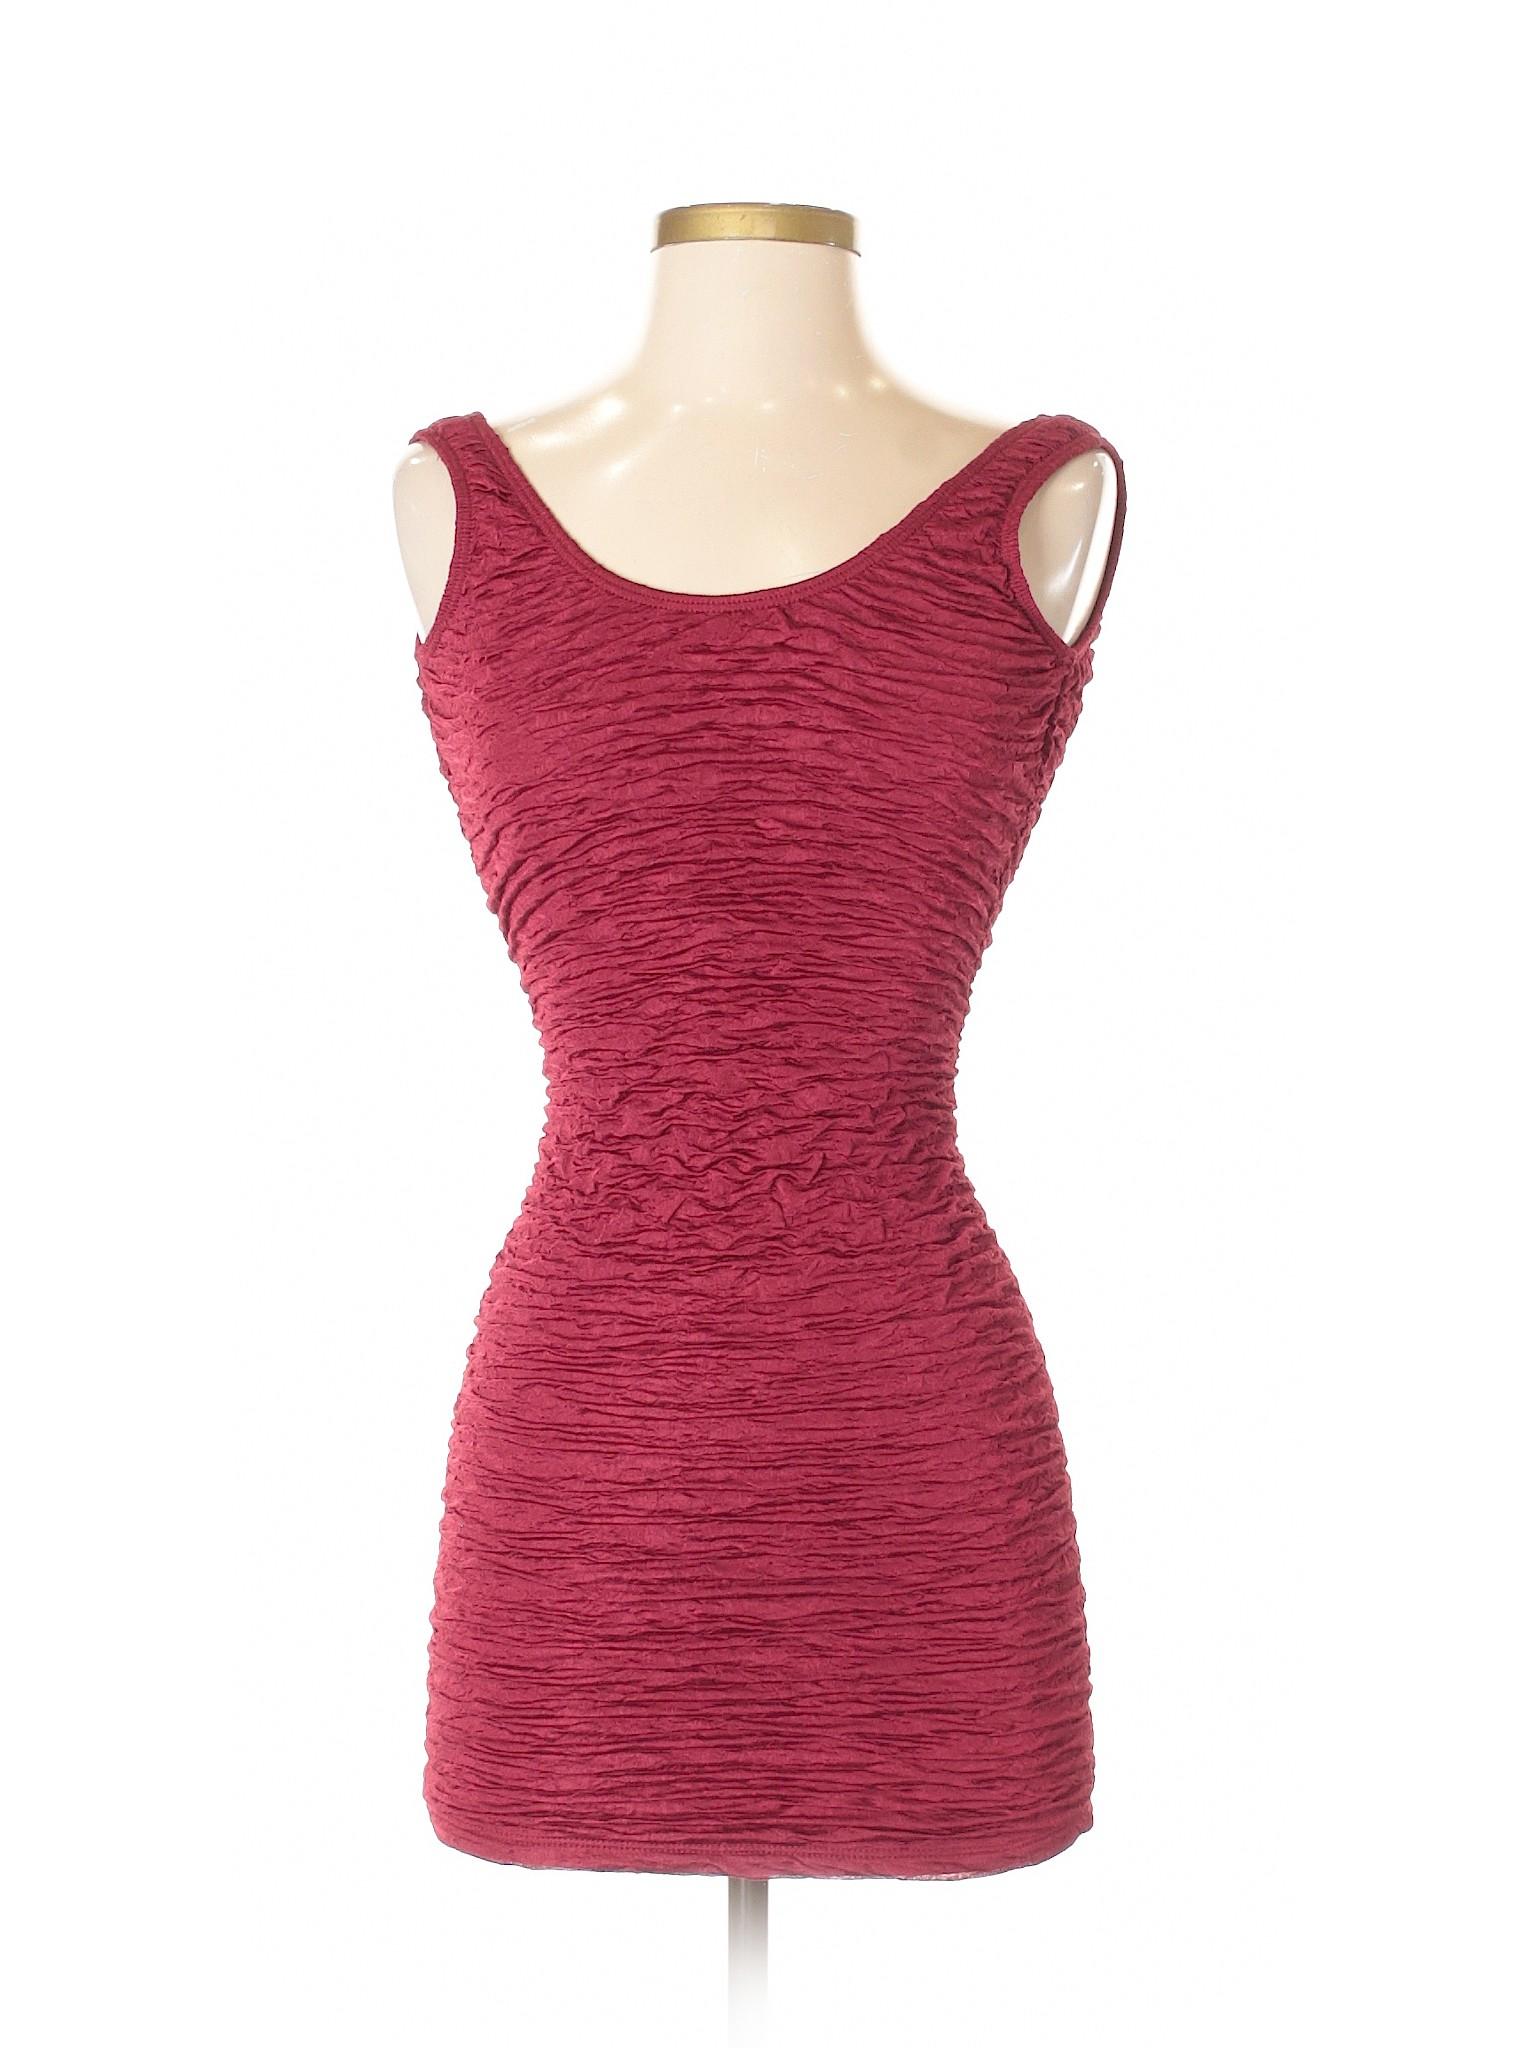 Arden Cocktail Dress Boutique B winter gqTwW58